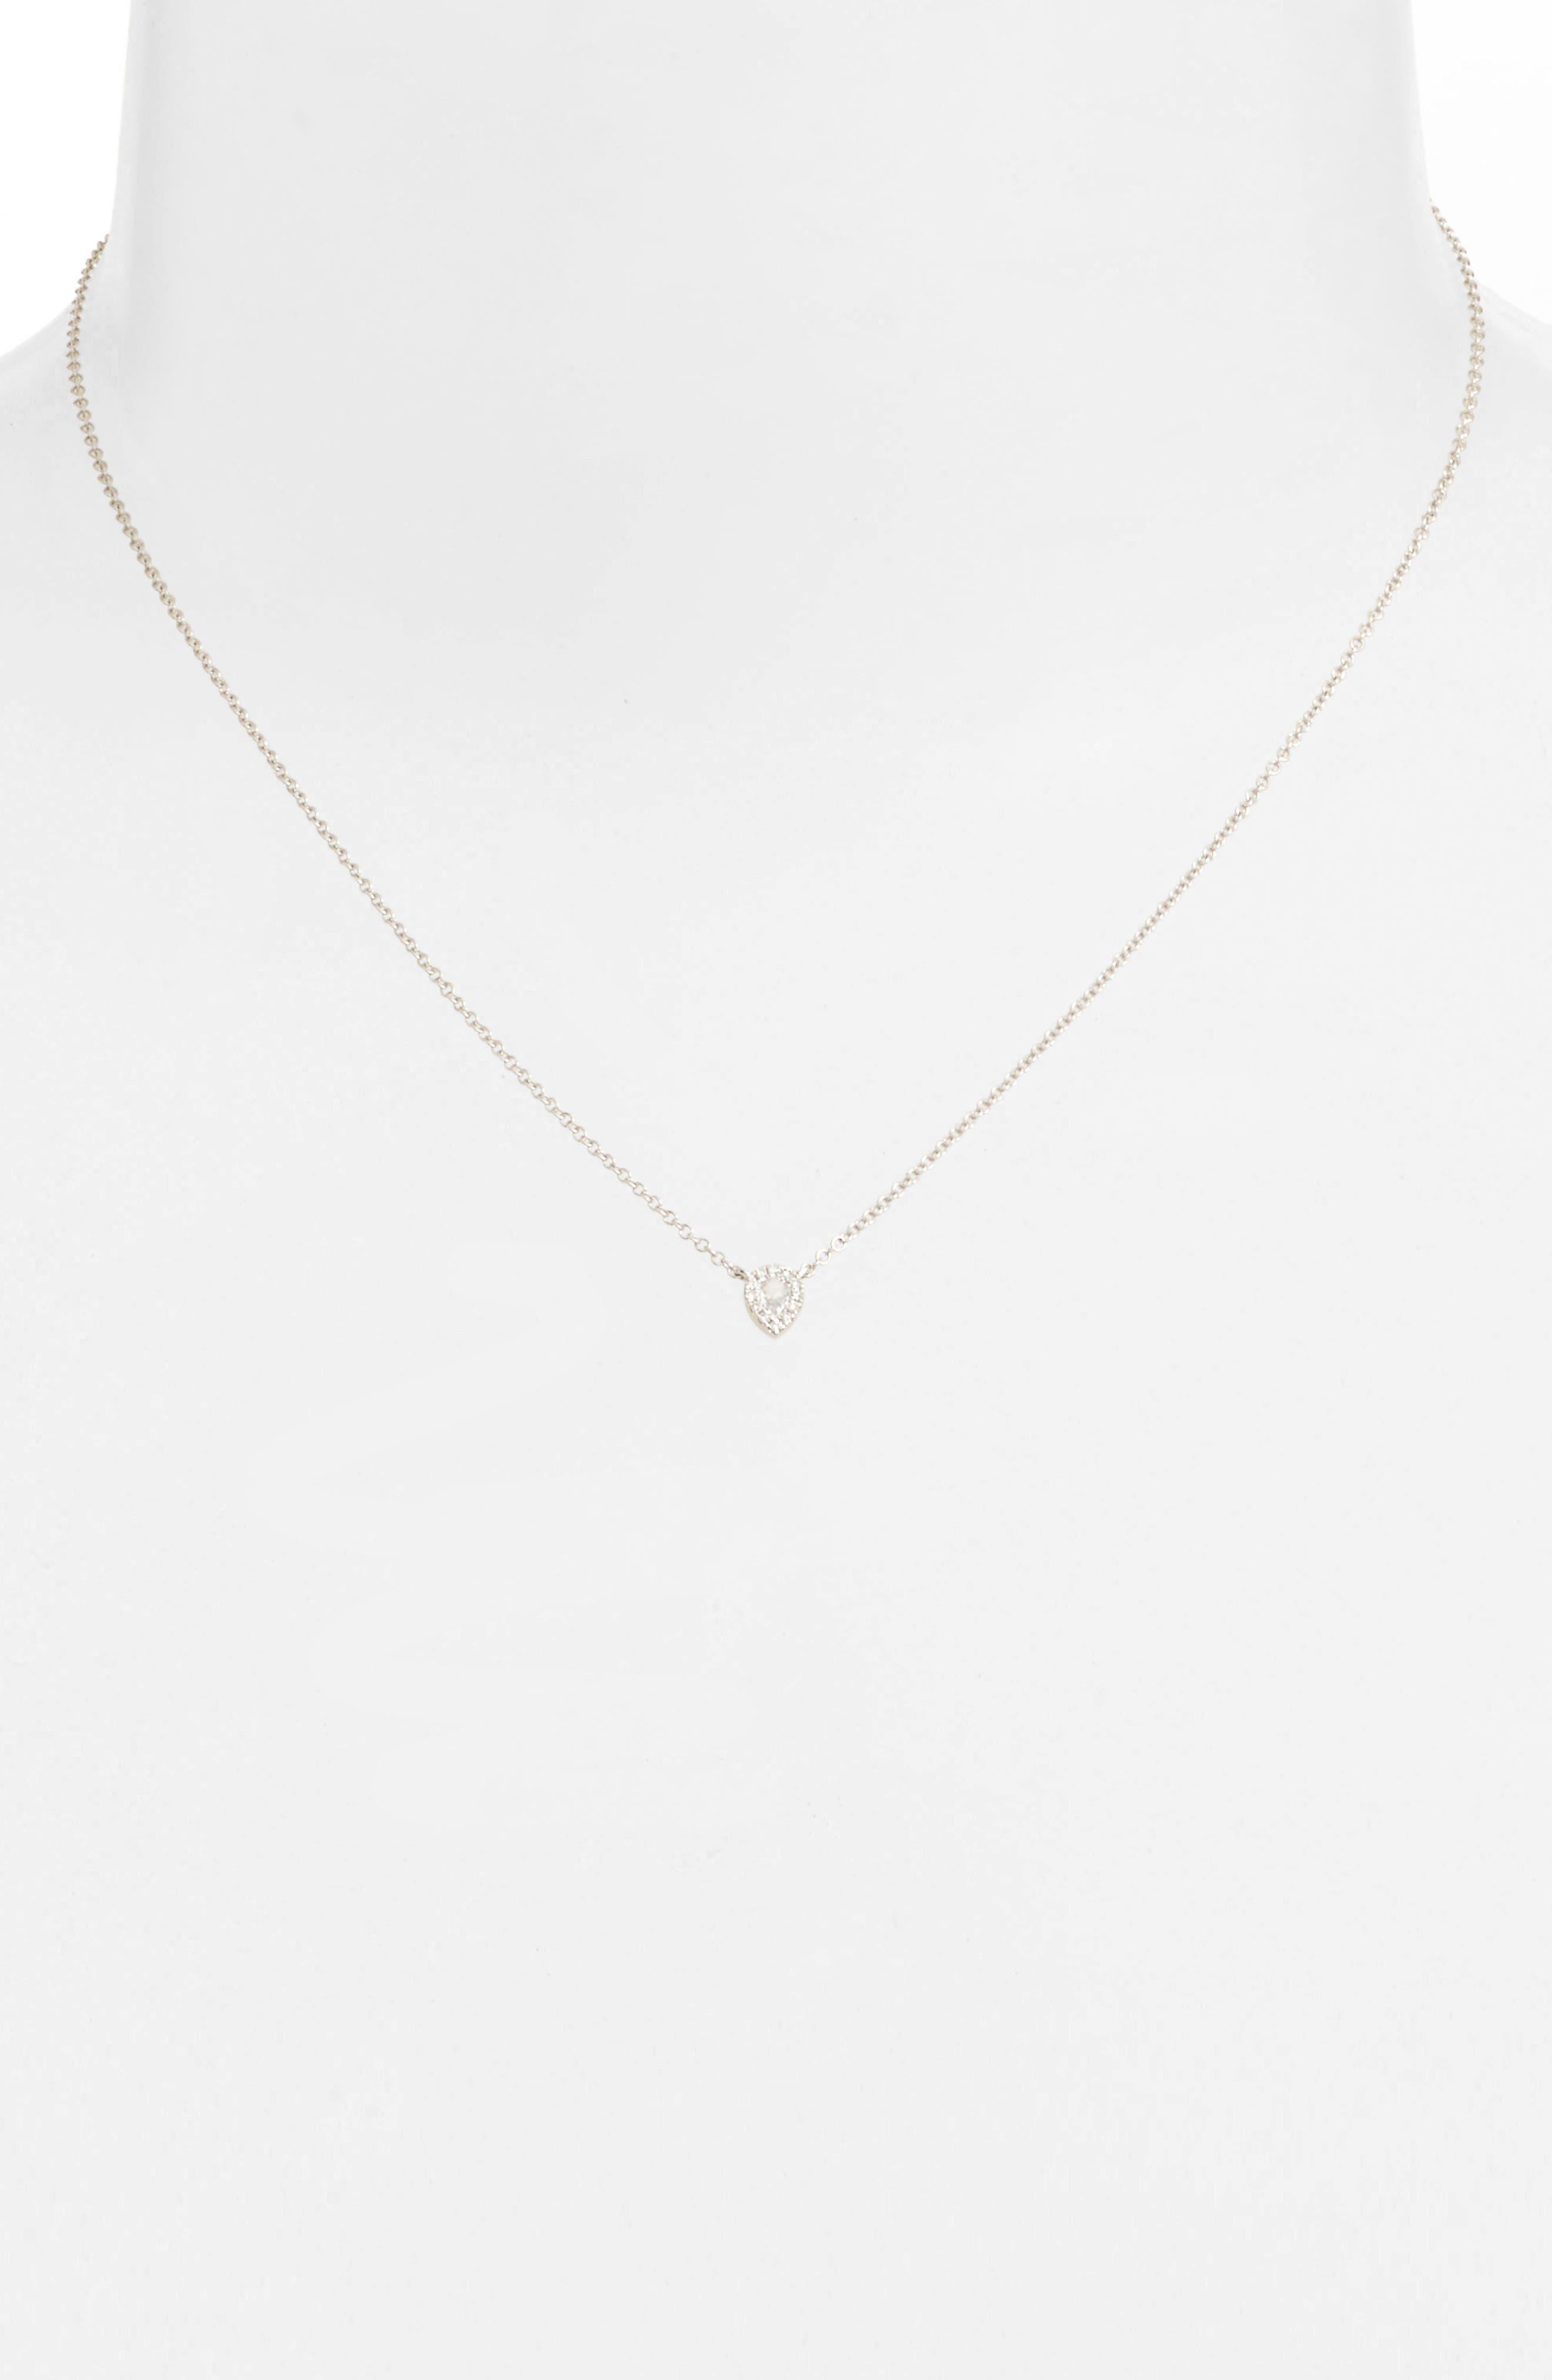 EF COLLECTION, Diamond & Topaz Teardrop Pendant Necklace, Alternate thumbnail 2, color, WHITE GOLD